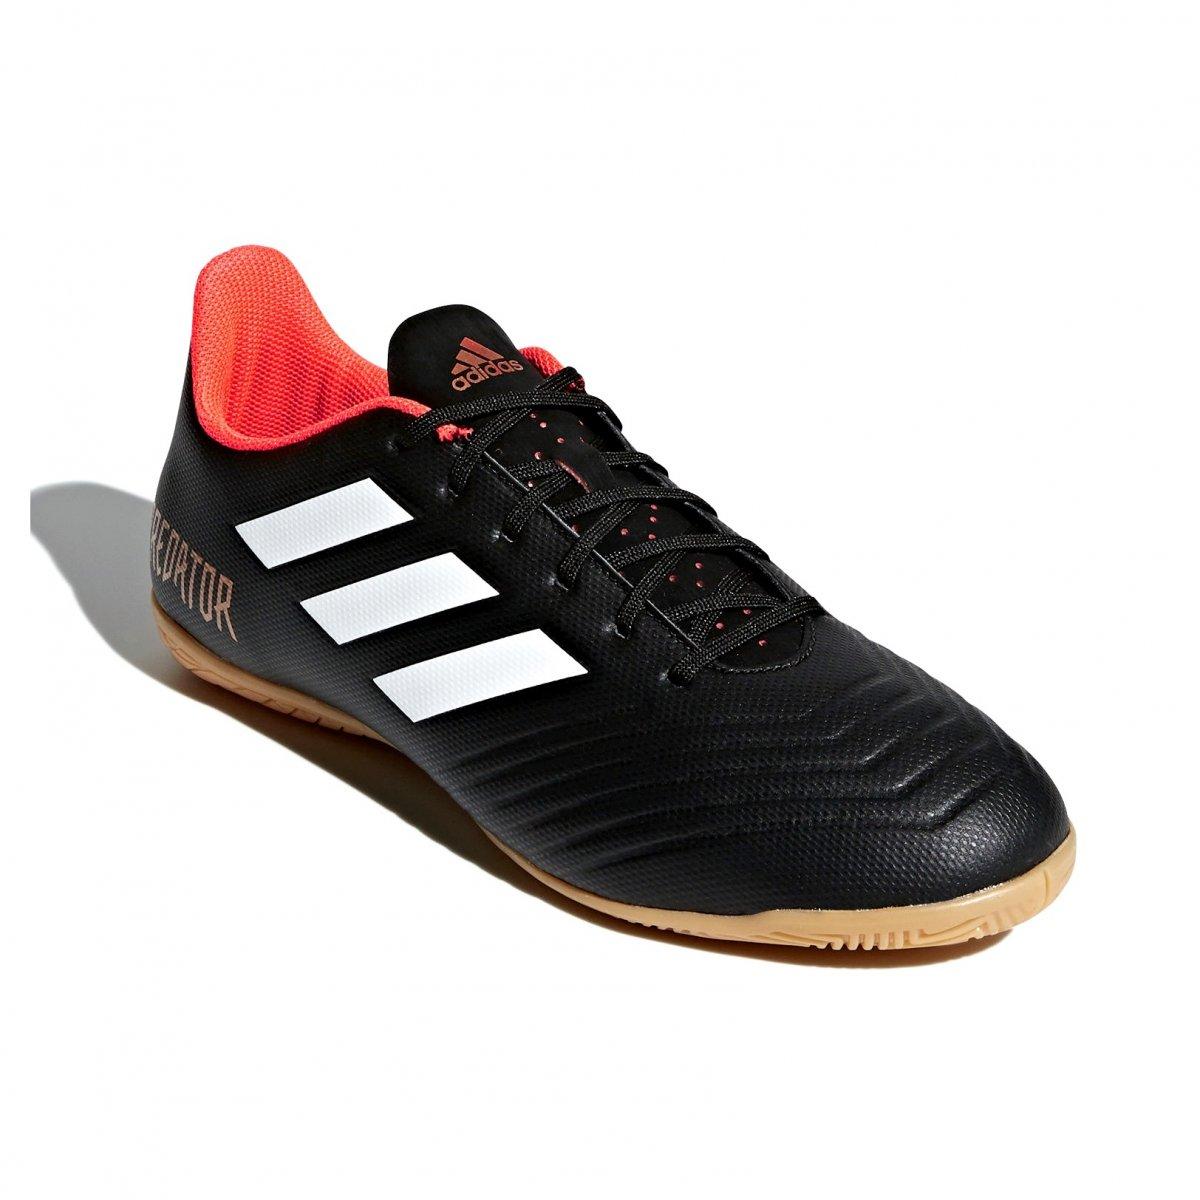 c4551da350e Indoor Futsal Adidas Predator Tango 18.4 IN CP9275 - Preto/Laranja ...